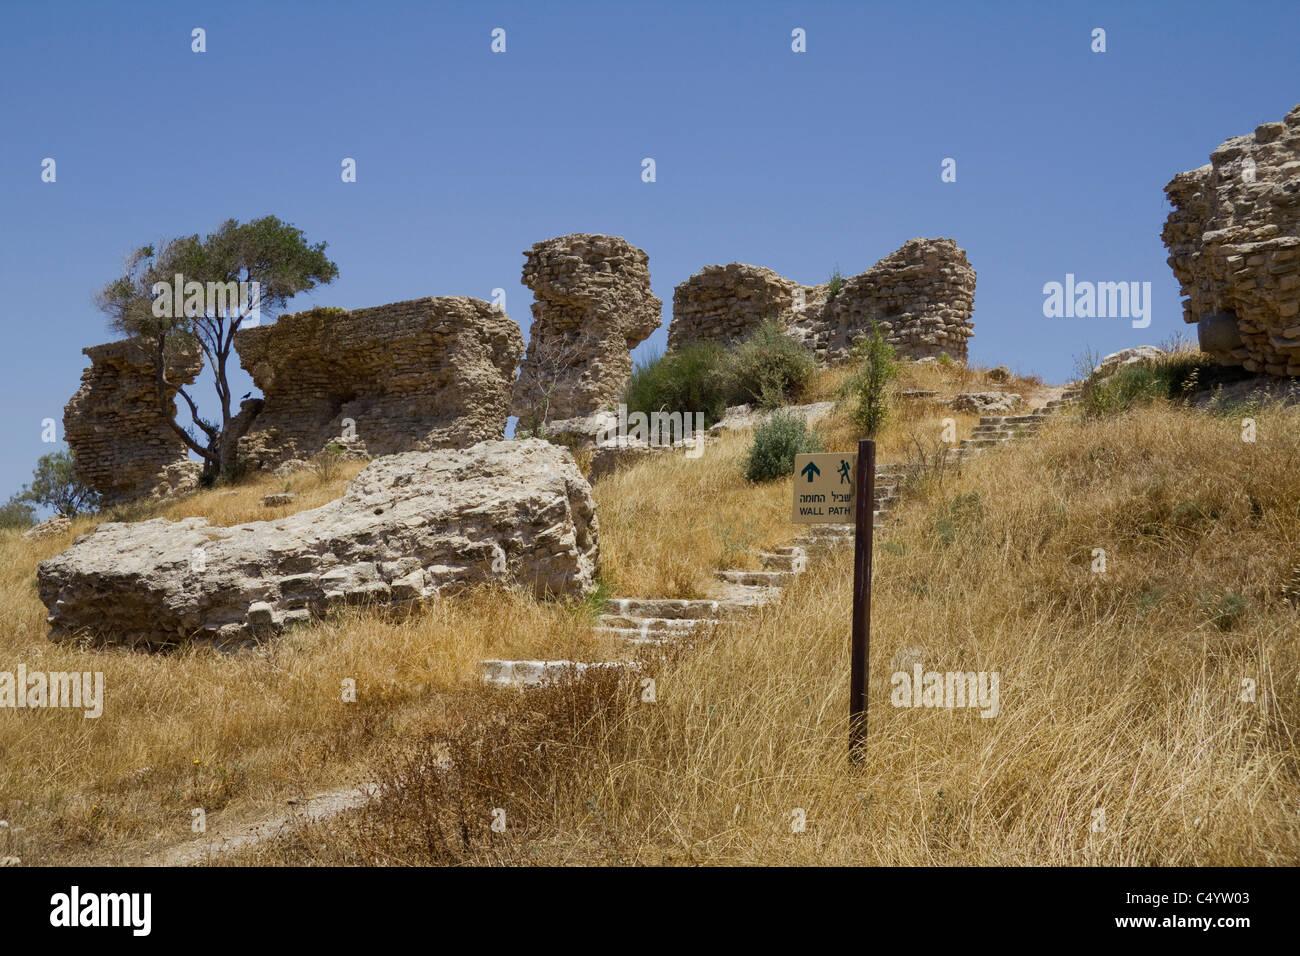 Canaanite fortifications Ashqelon Ashkelon National Park, Israel - Stock Image